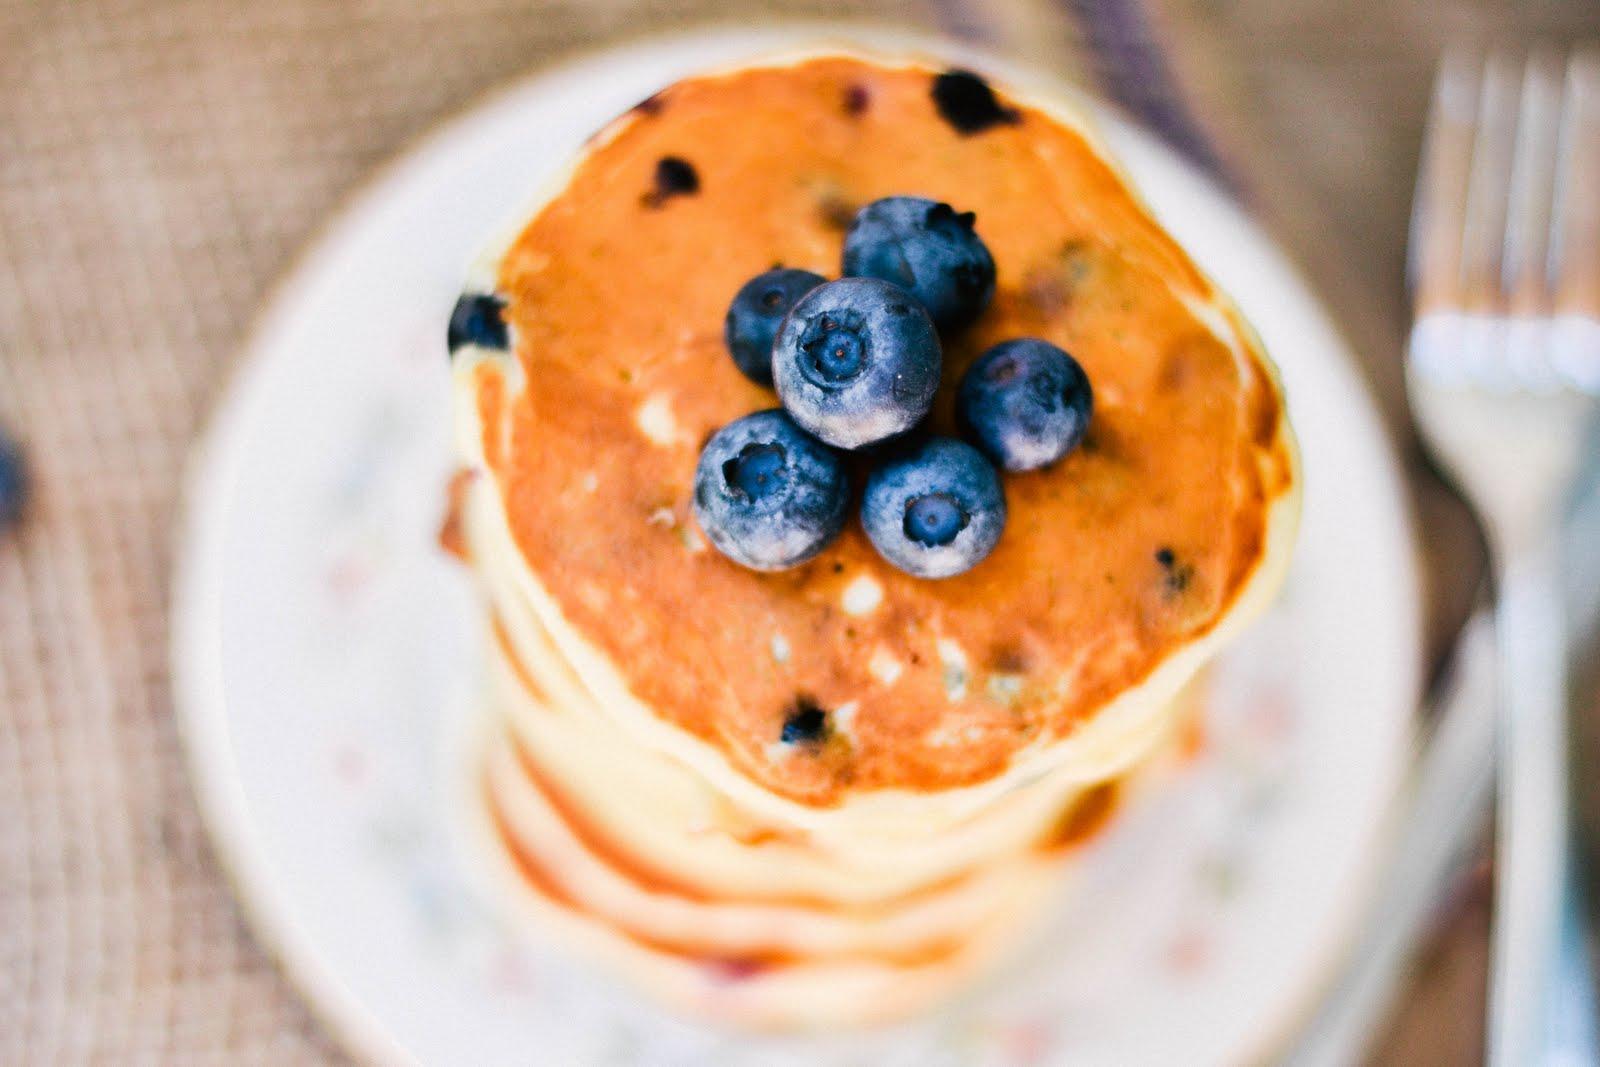 lemon+cocnut+pancakes-1-2.jpg